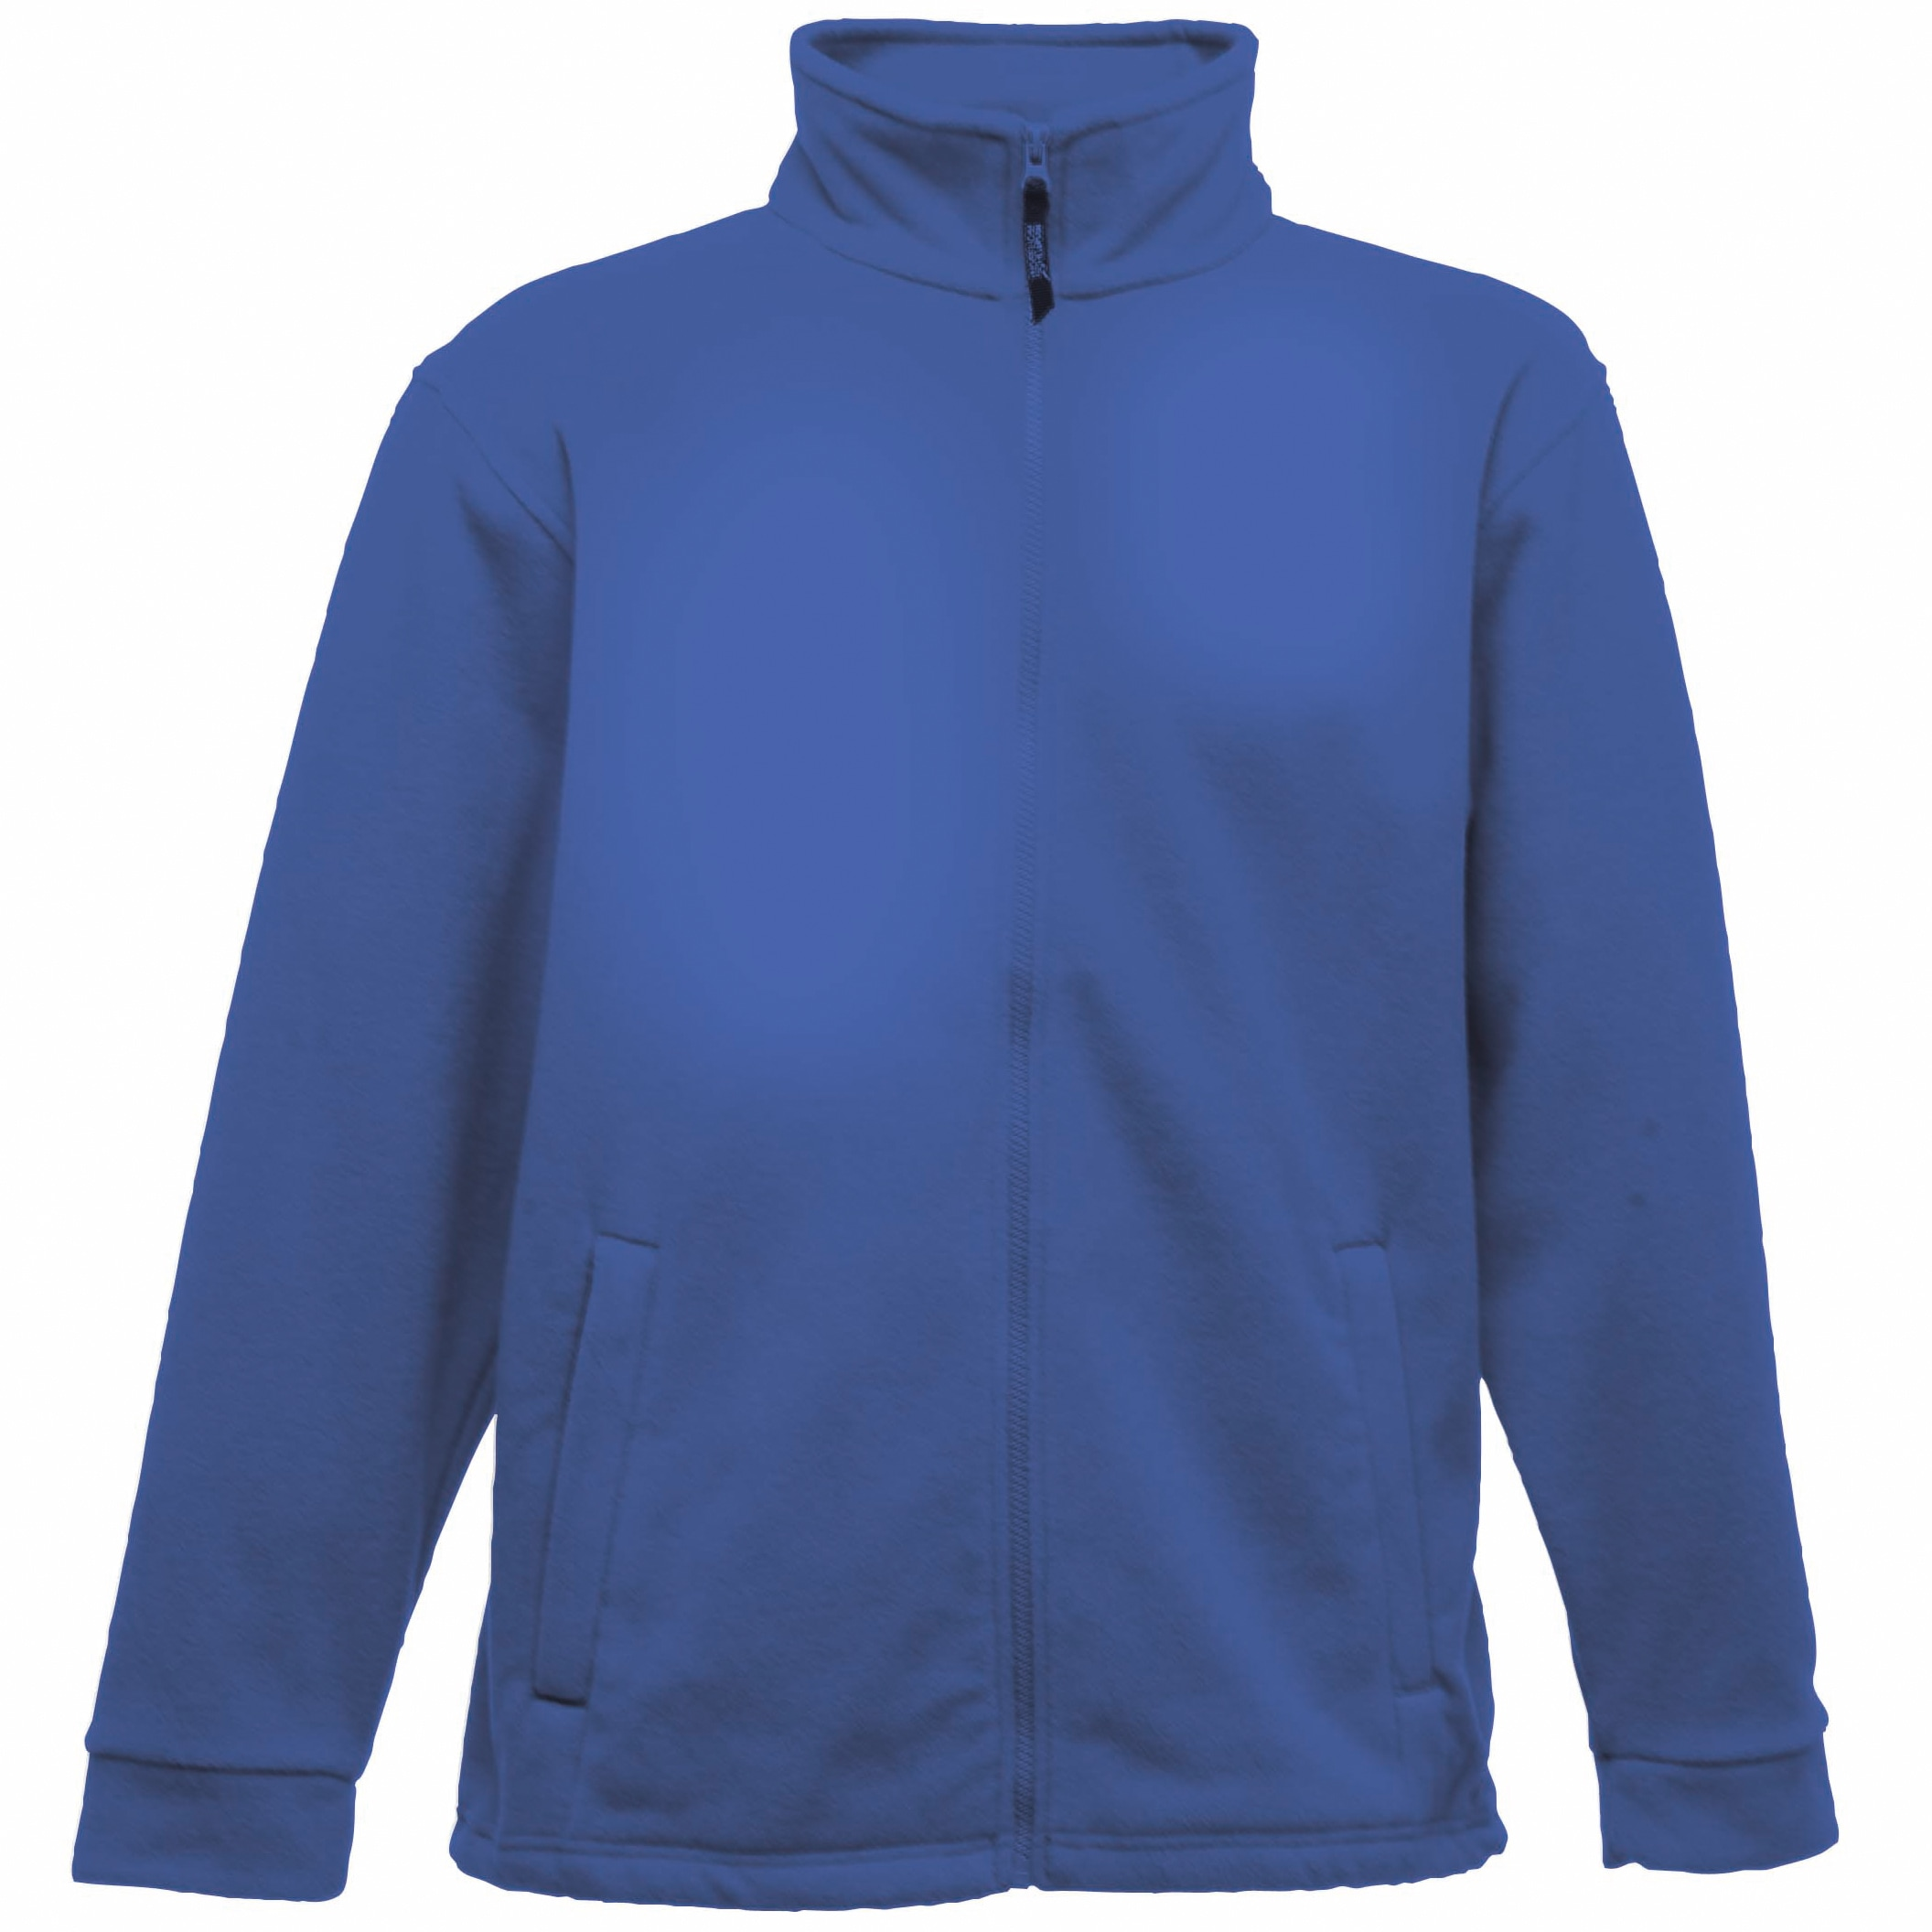 Regatta Fleecejacke Professional Herren Thor 300 Fleece-Jacke   Bekleidung > Jacken > Sonstige Jacken   Regatta